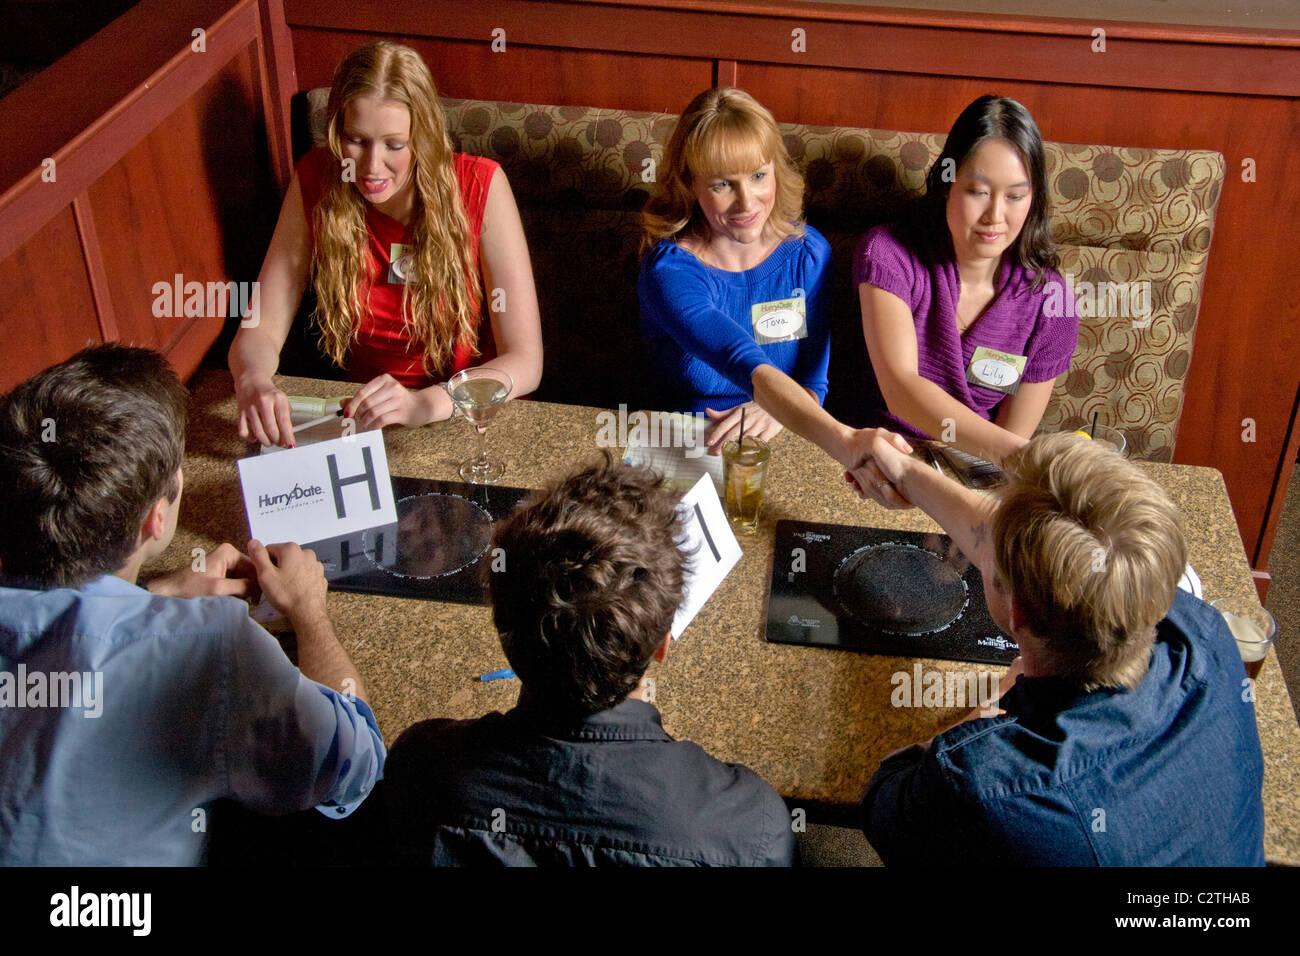 speed dating restaurant